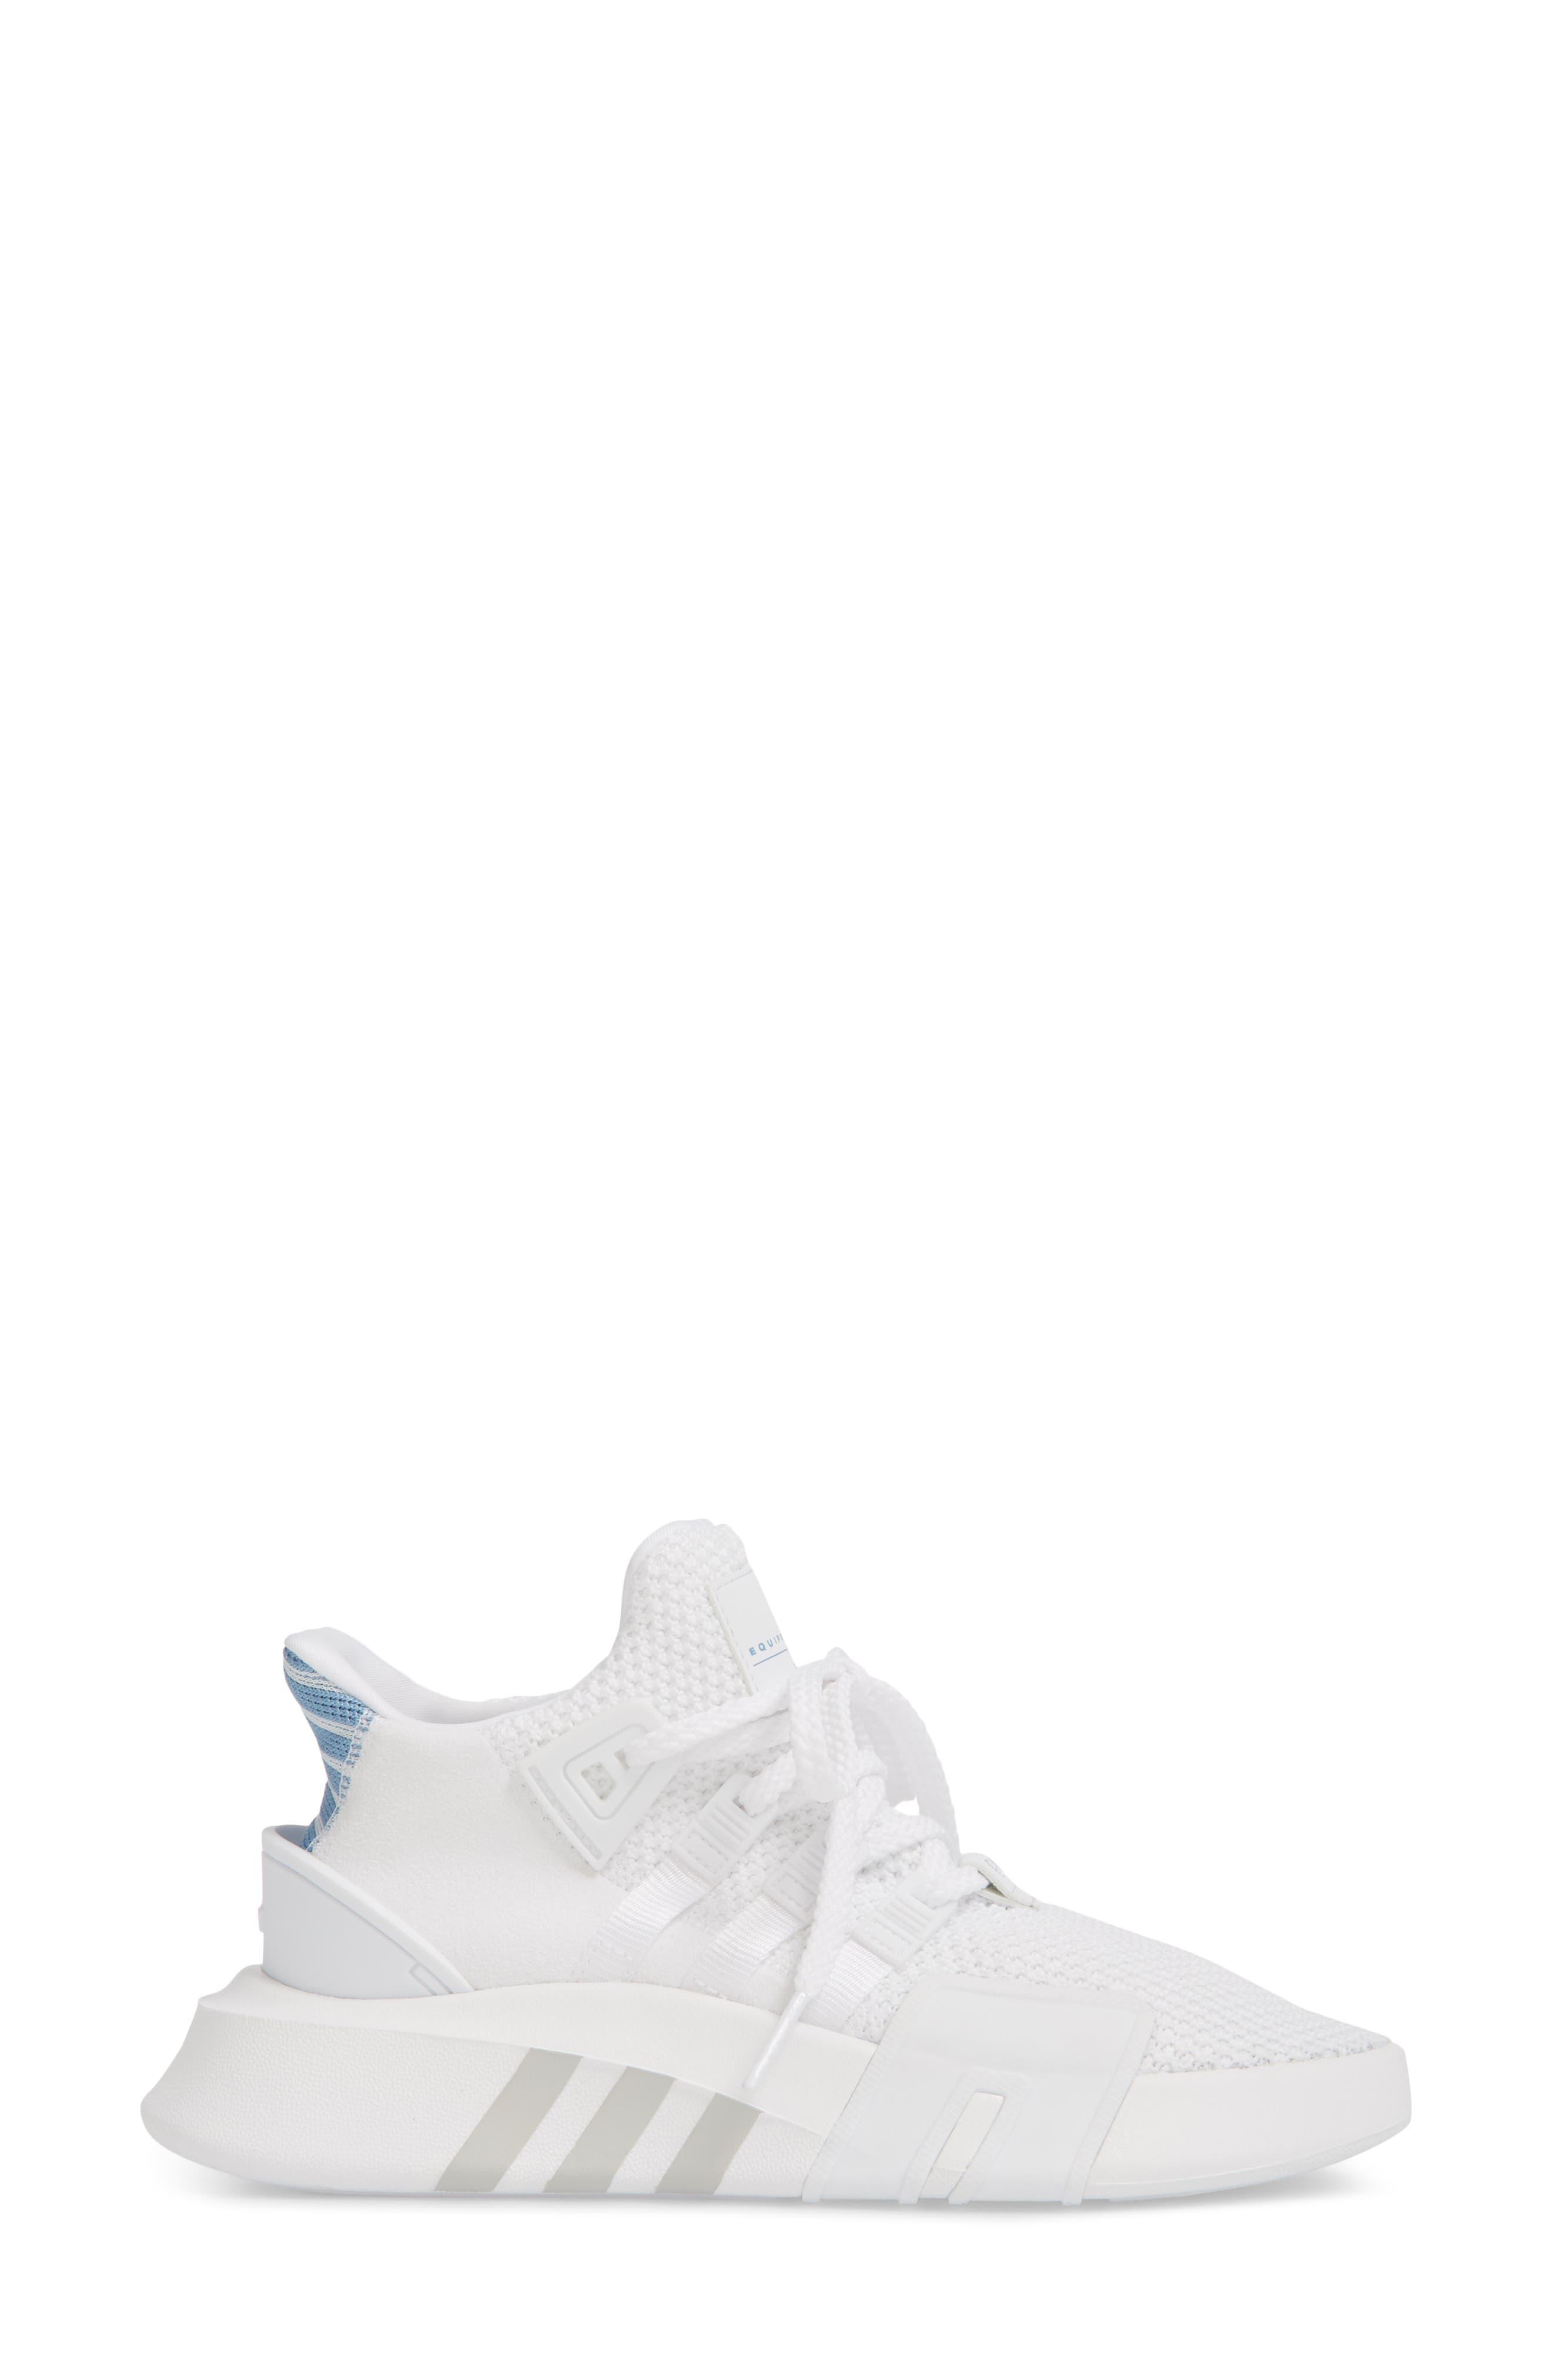 EQT Basketball ADV Sneaker,                             Alternate thumbnail 3, color,                             100